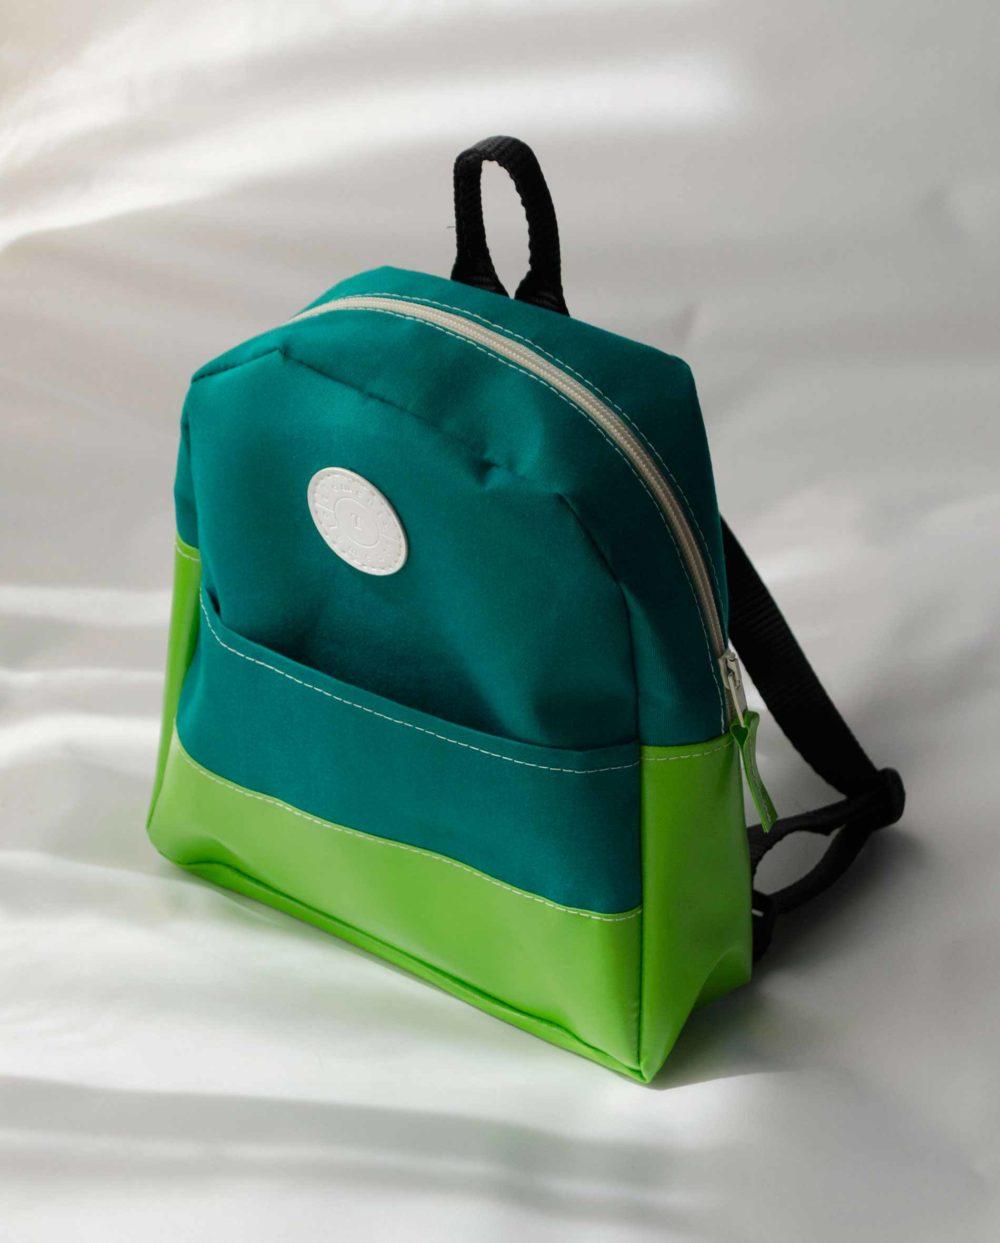 zainetto-baby-verde-fluo-1